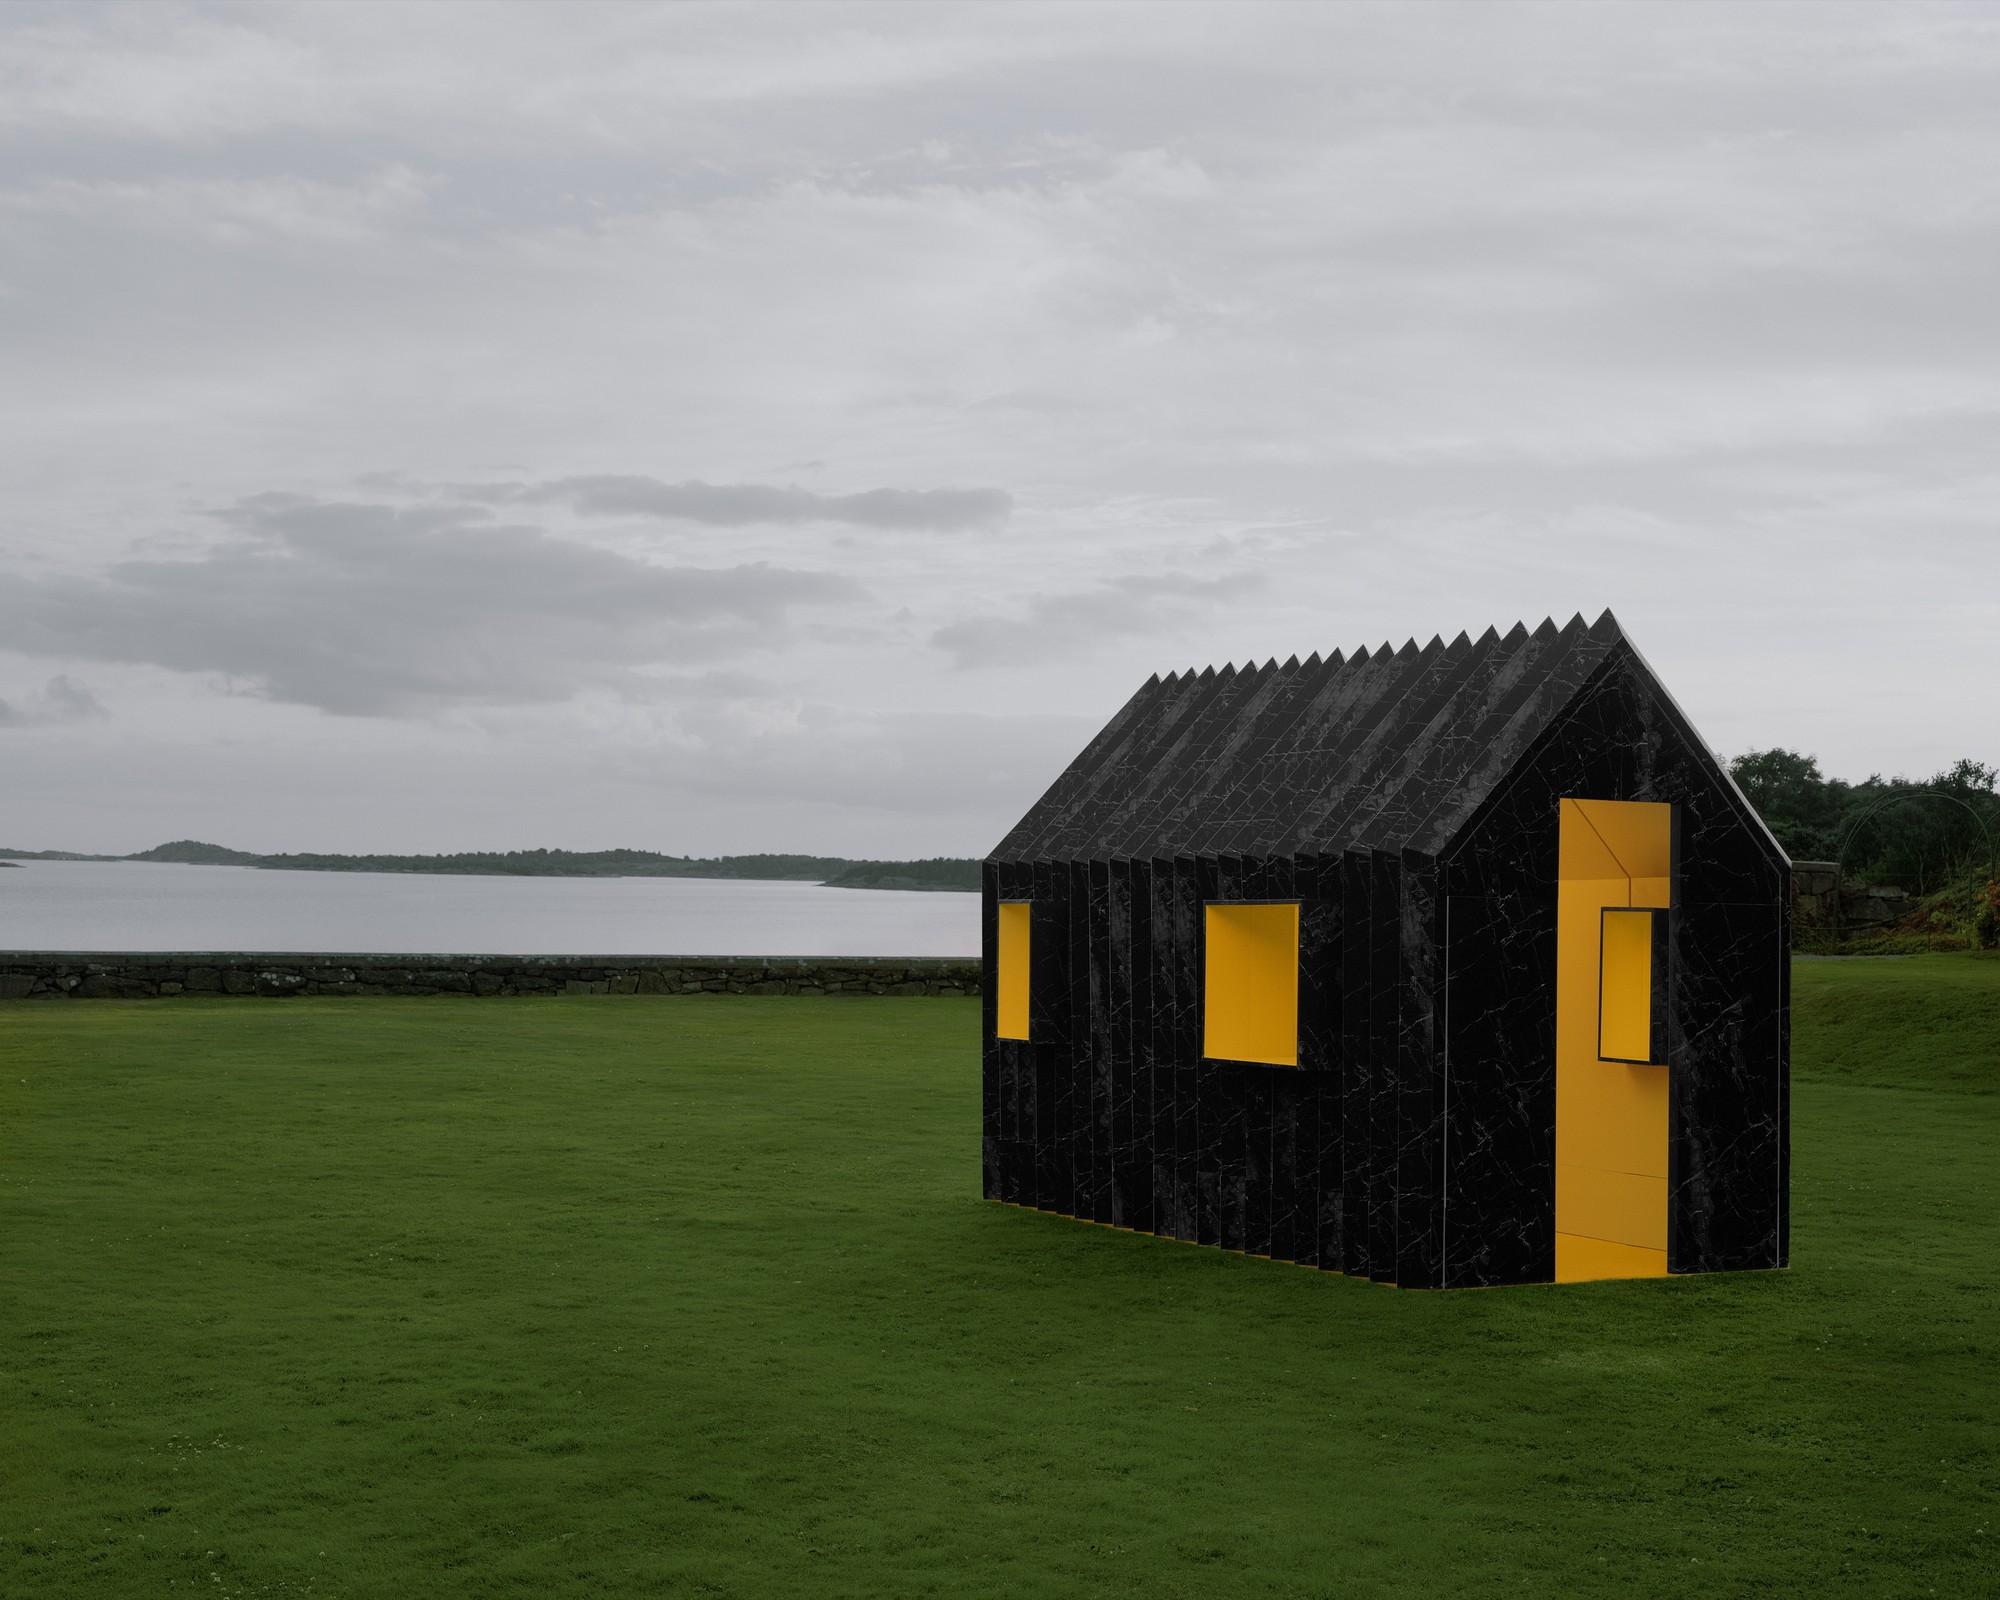 Chameleon Cabin / White Arkitekter, © Rasmus Norlander